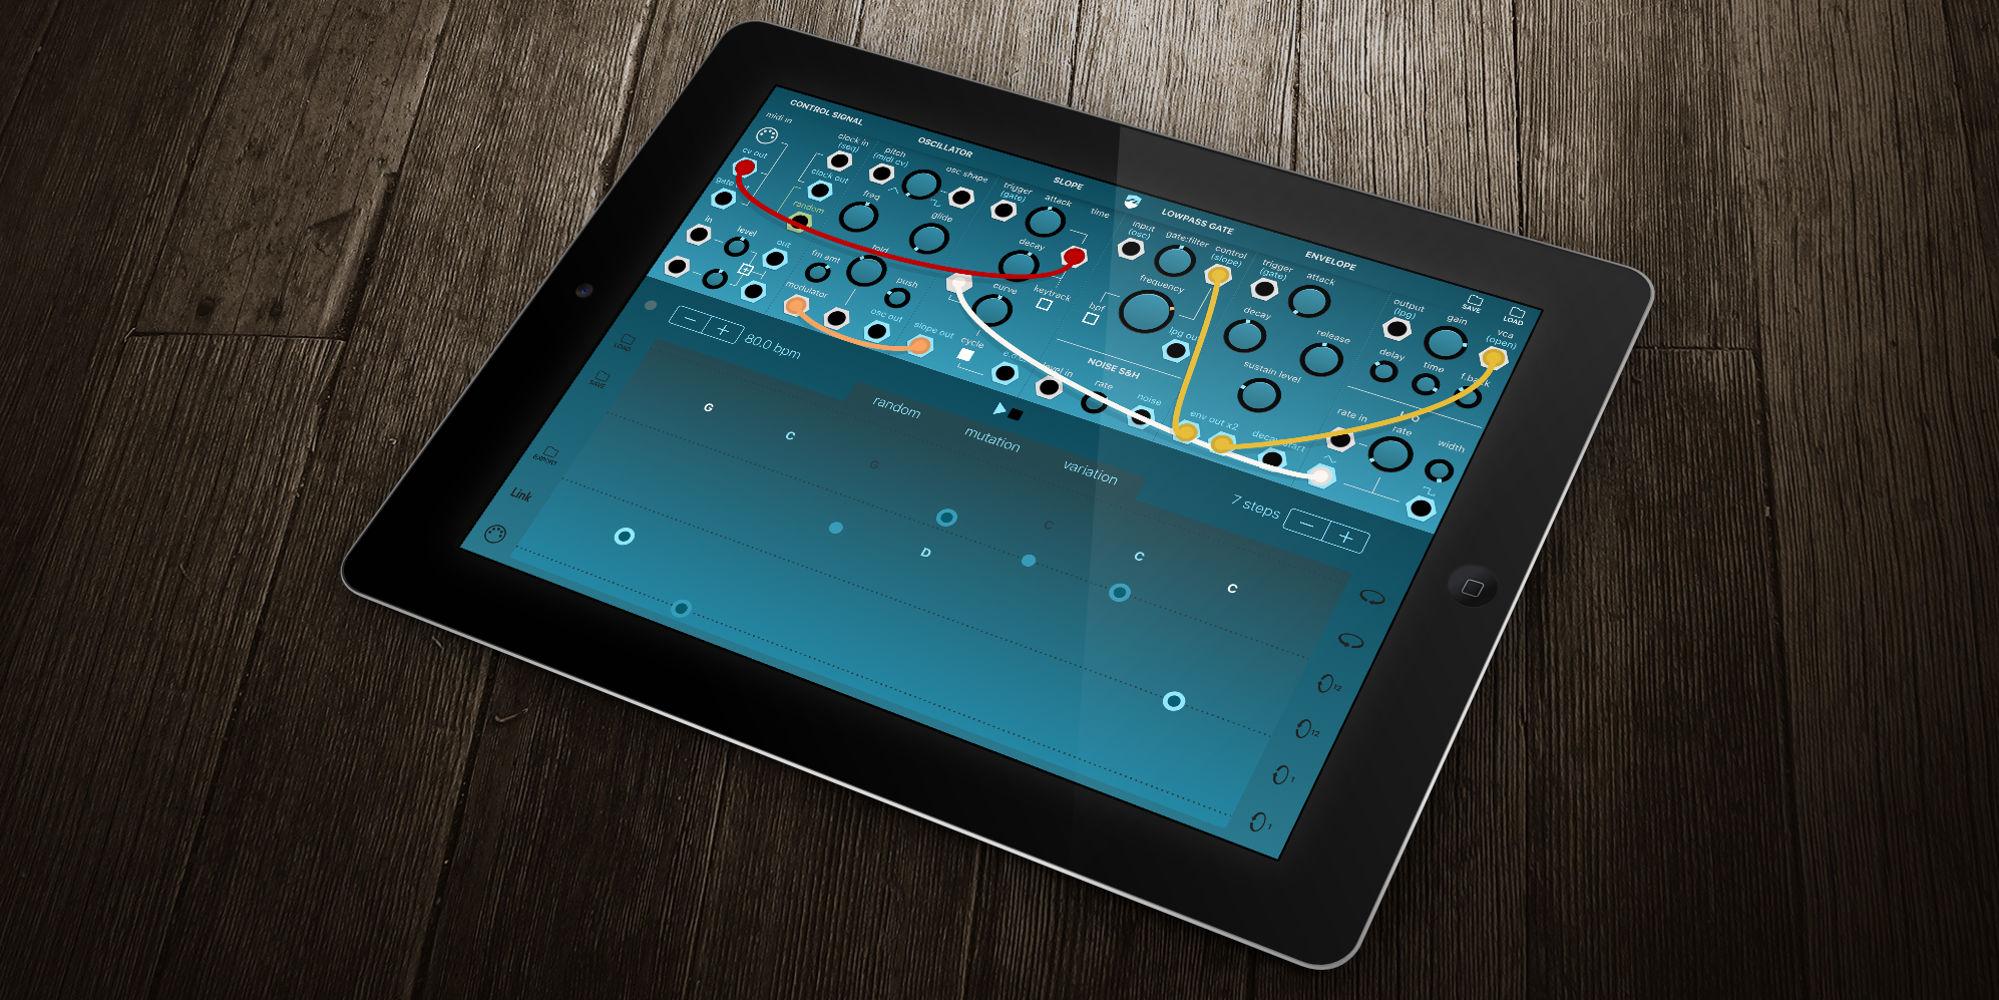 Ripplemaker Ruismaker Download Image Shunt Regulator Circuit Pc Android Iphone And Ipad Header